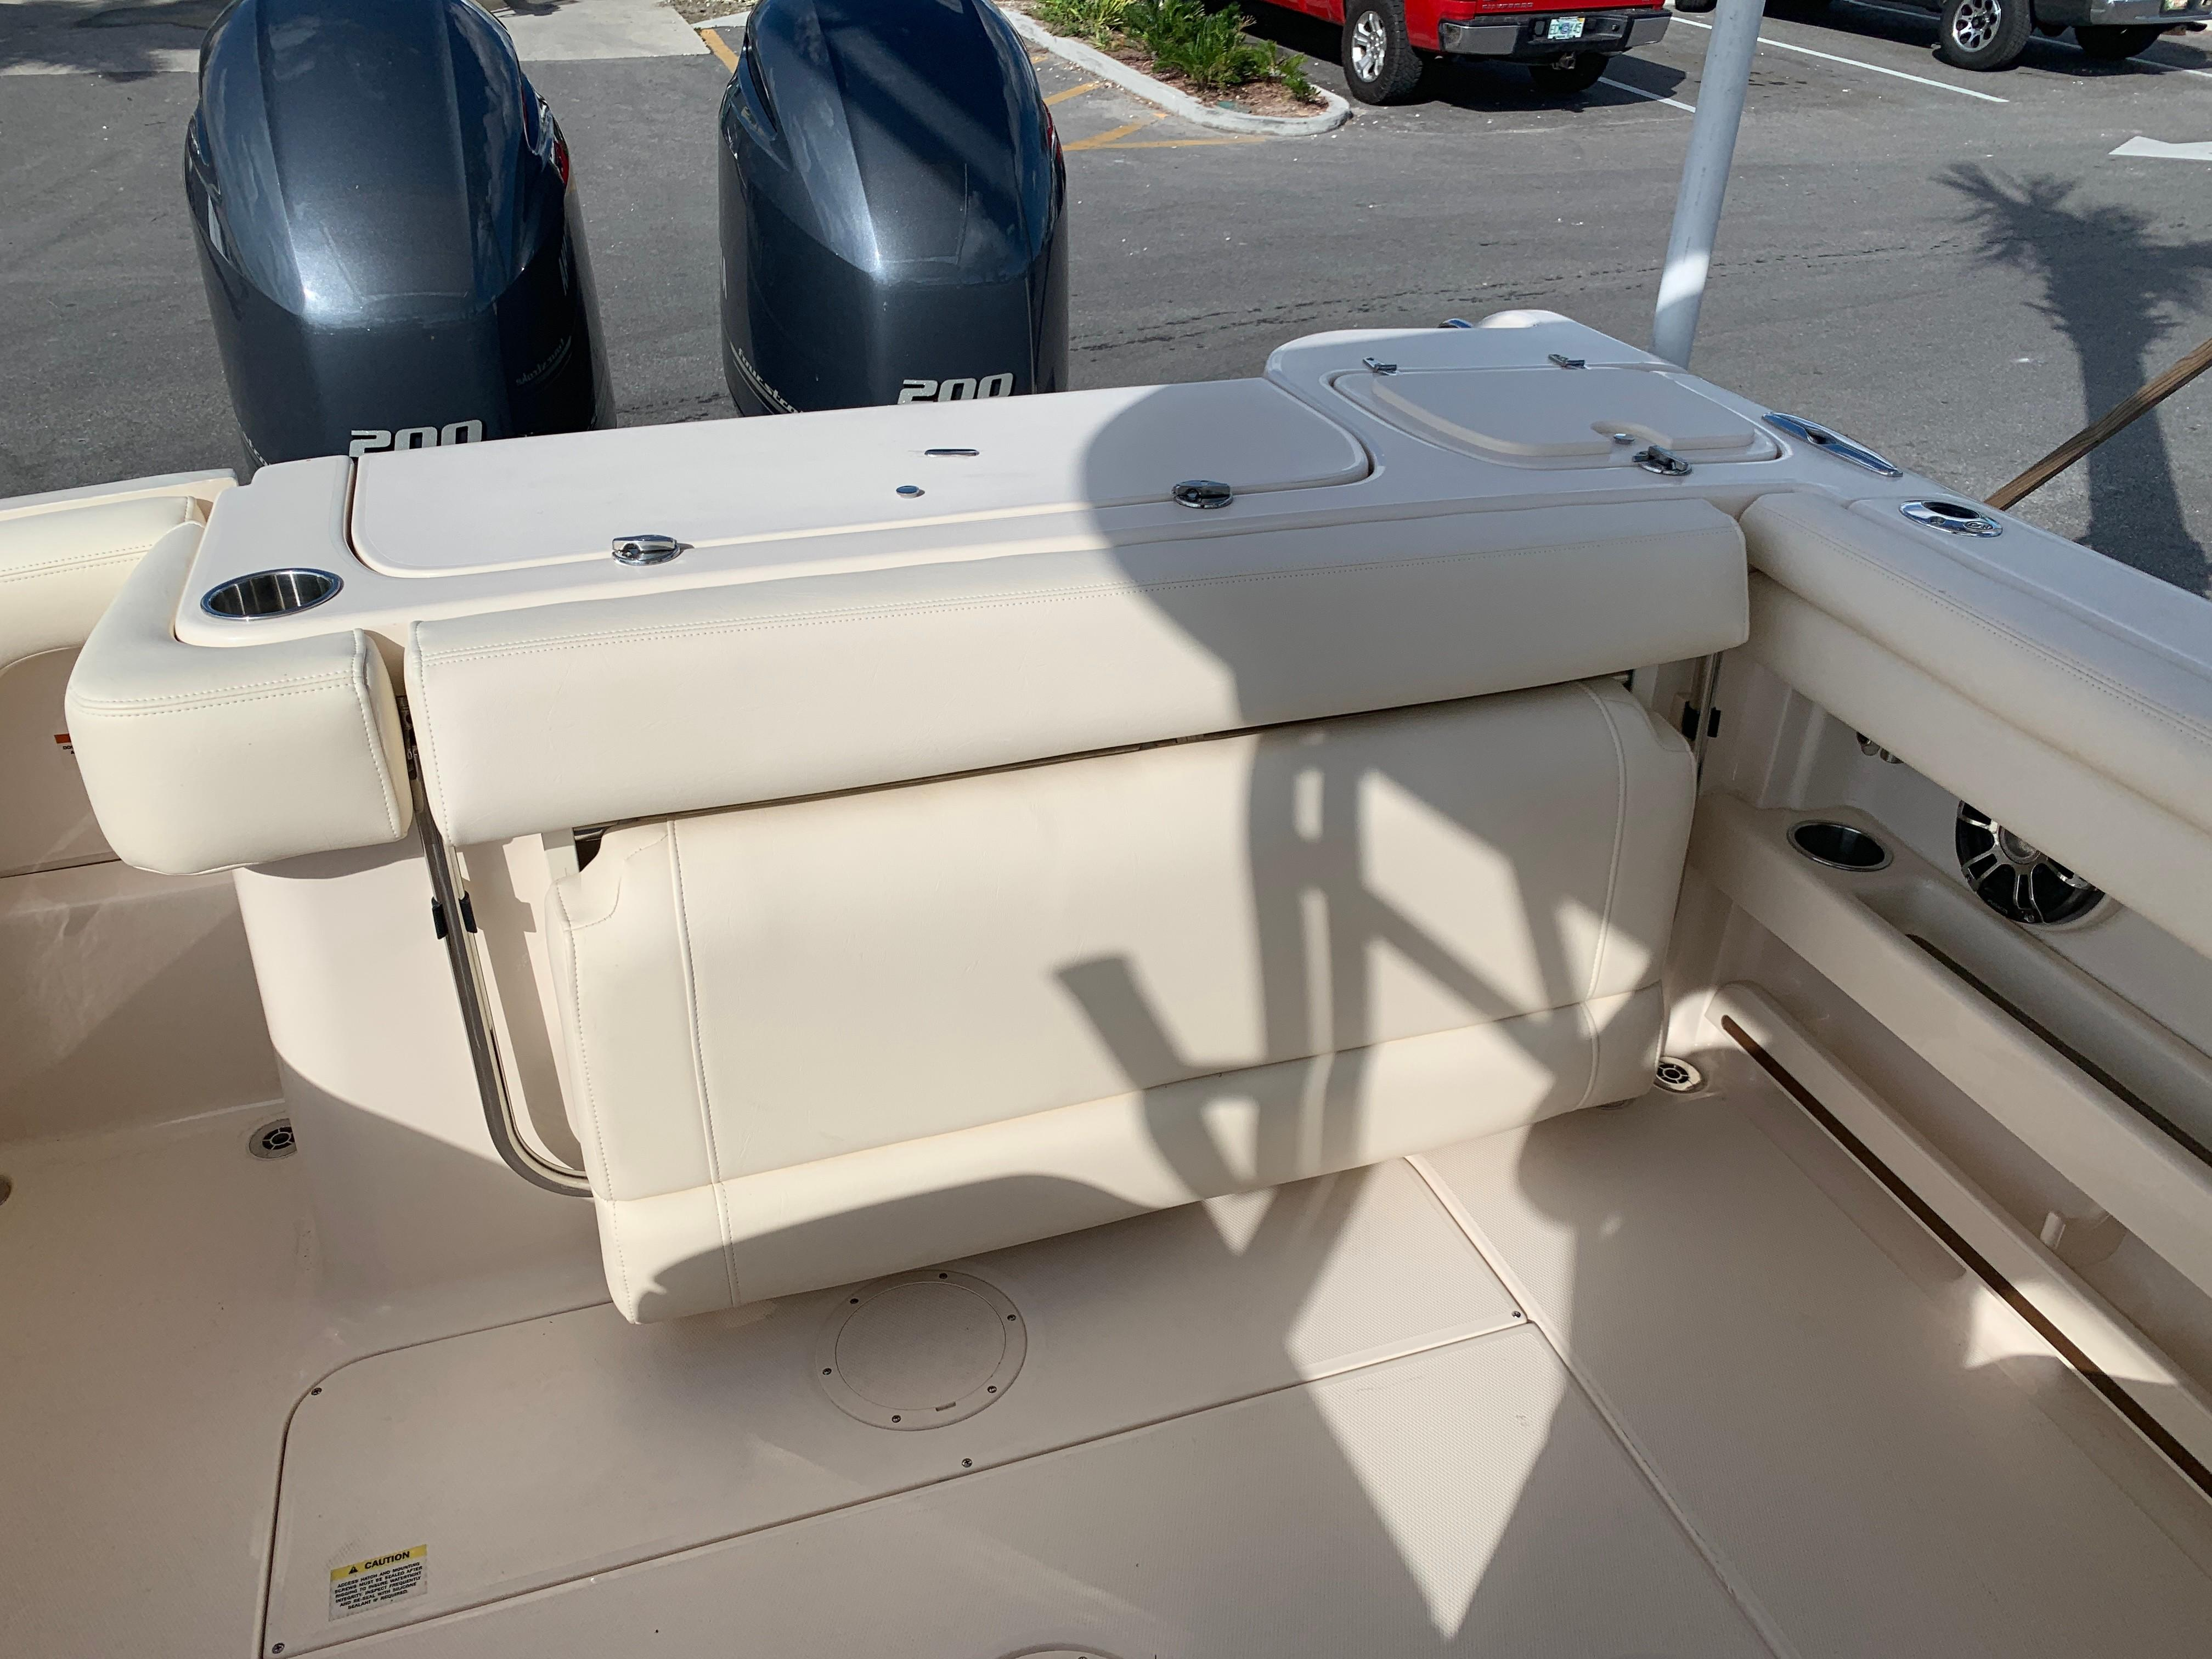 2020 Grady-White                                                              Freedom 275 Twin Engine Image Thumbnail #5